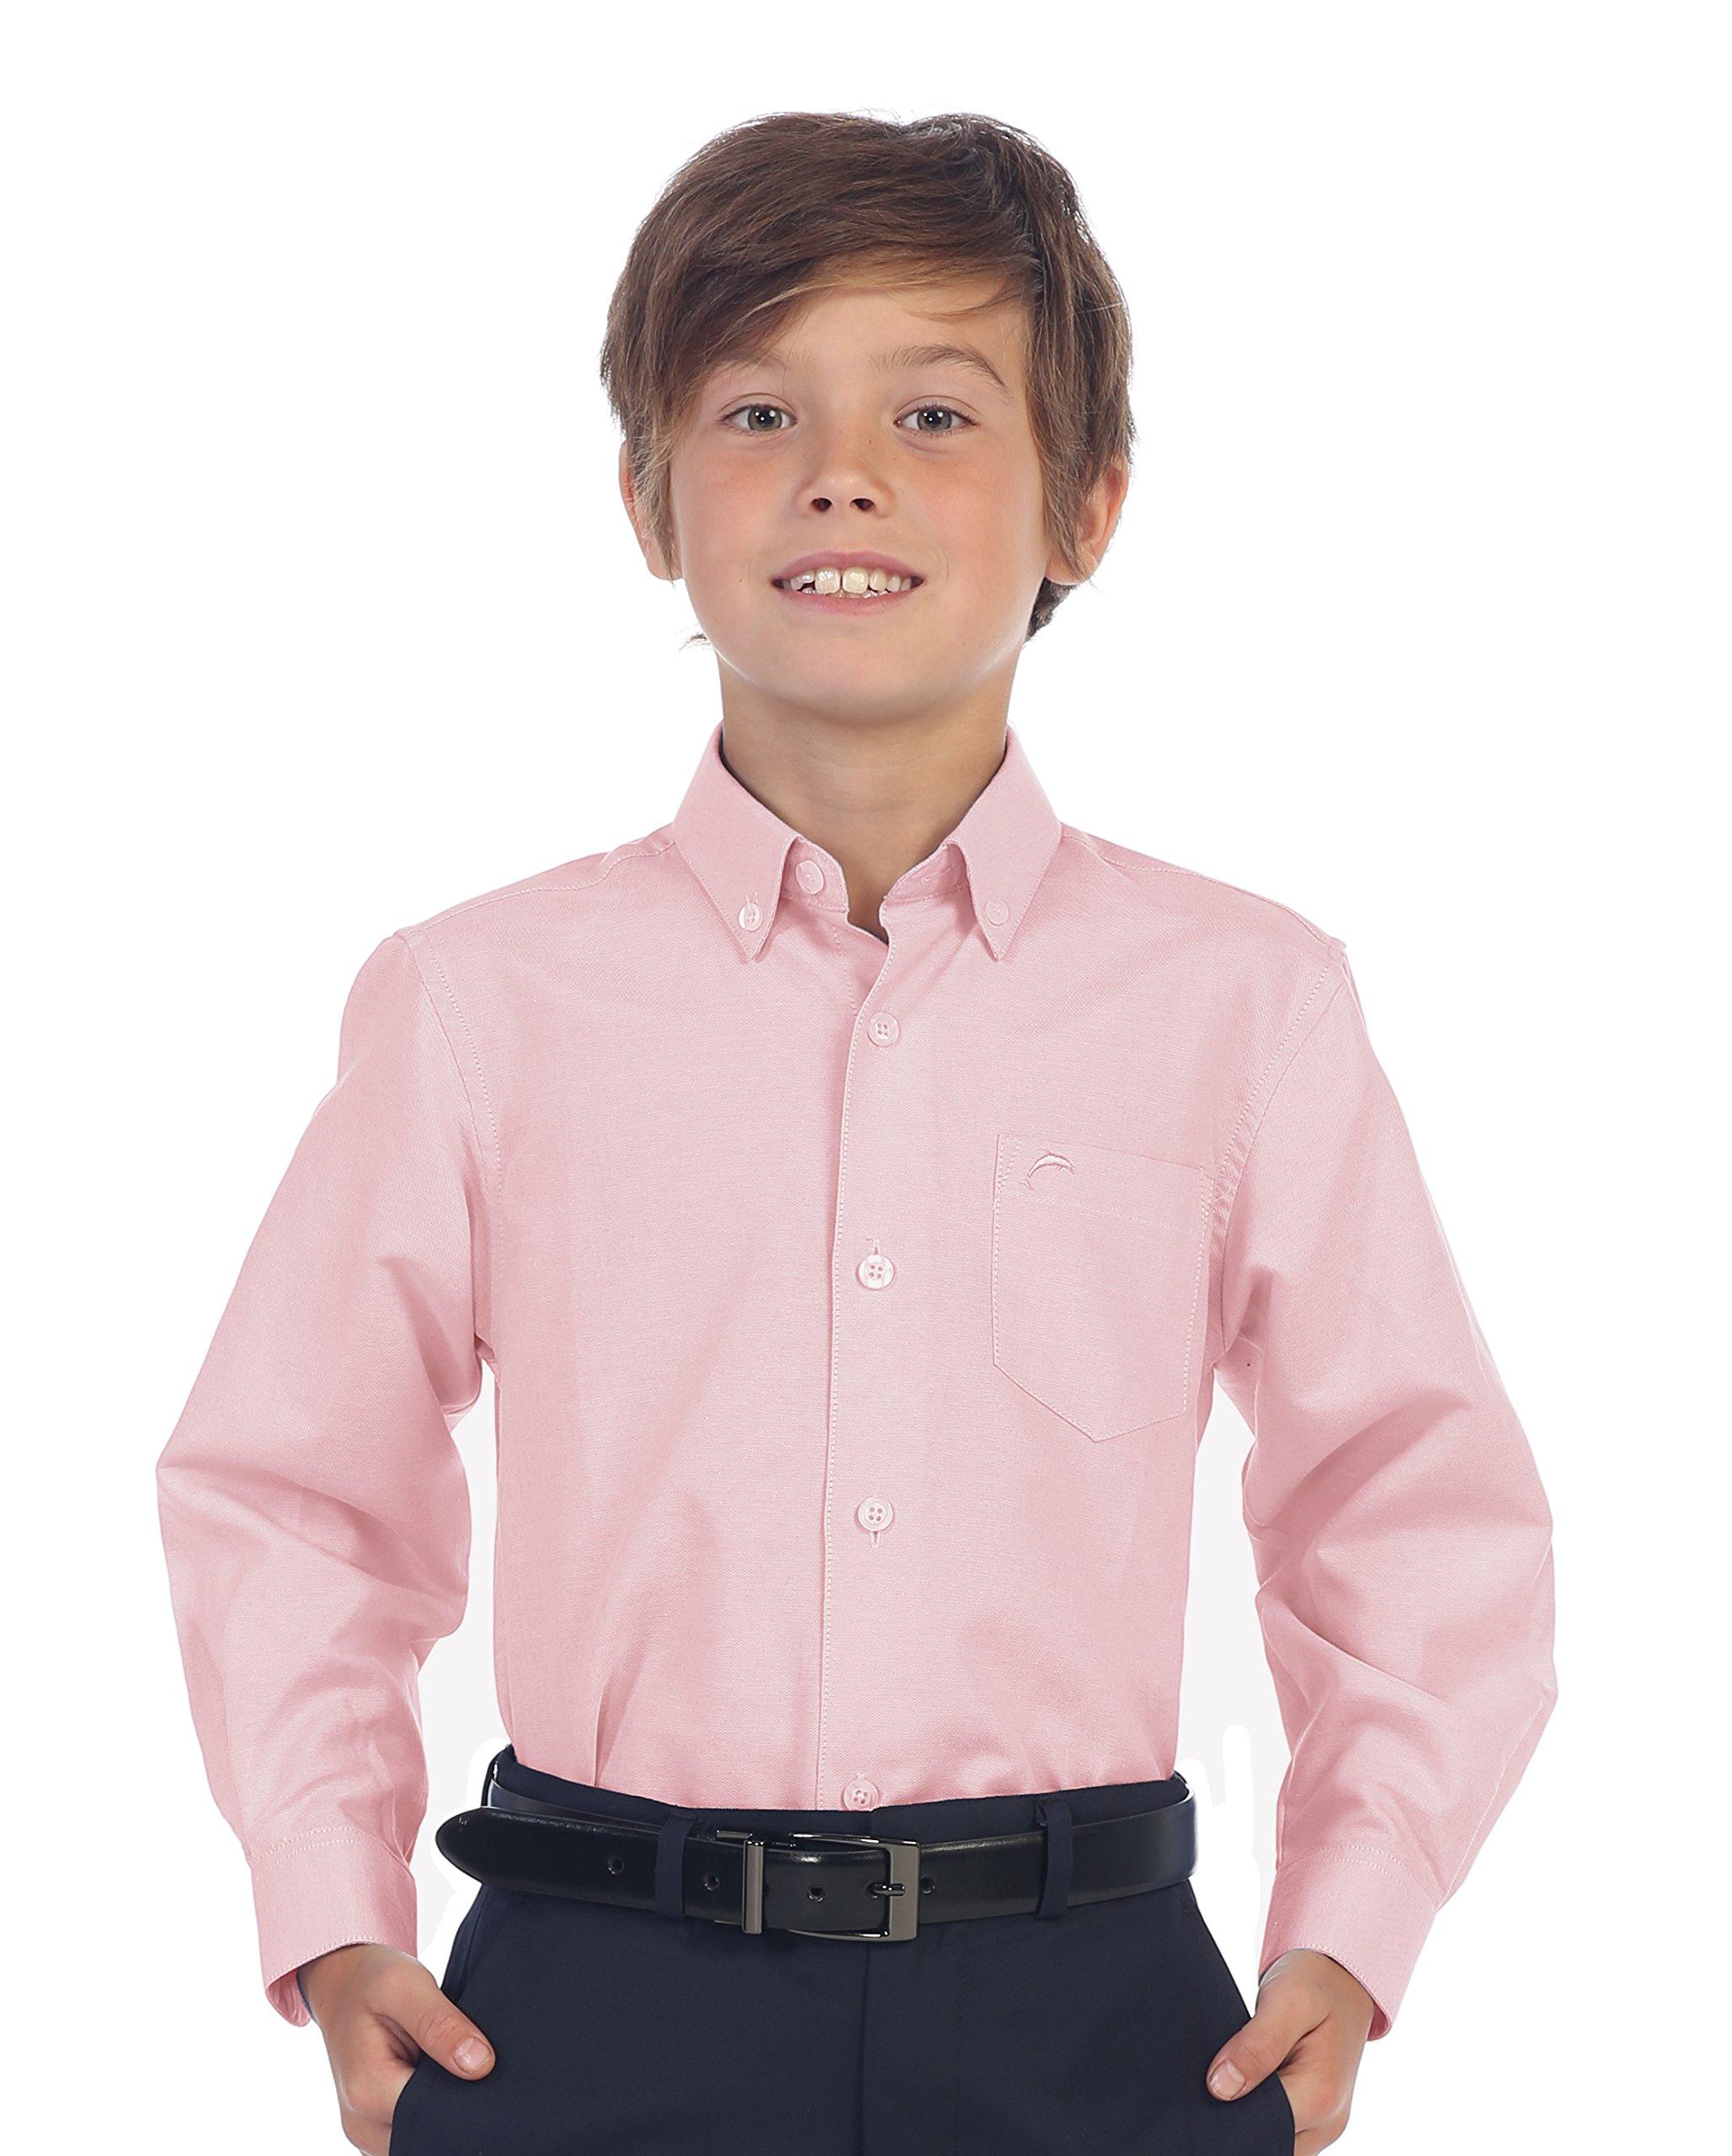 Gioberti Boy's Oxford Long Sleeve Dress Shirt, Pink, Size 5